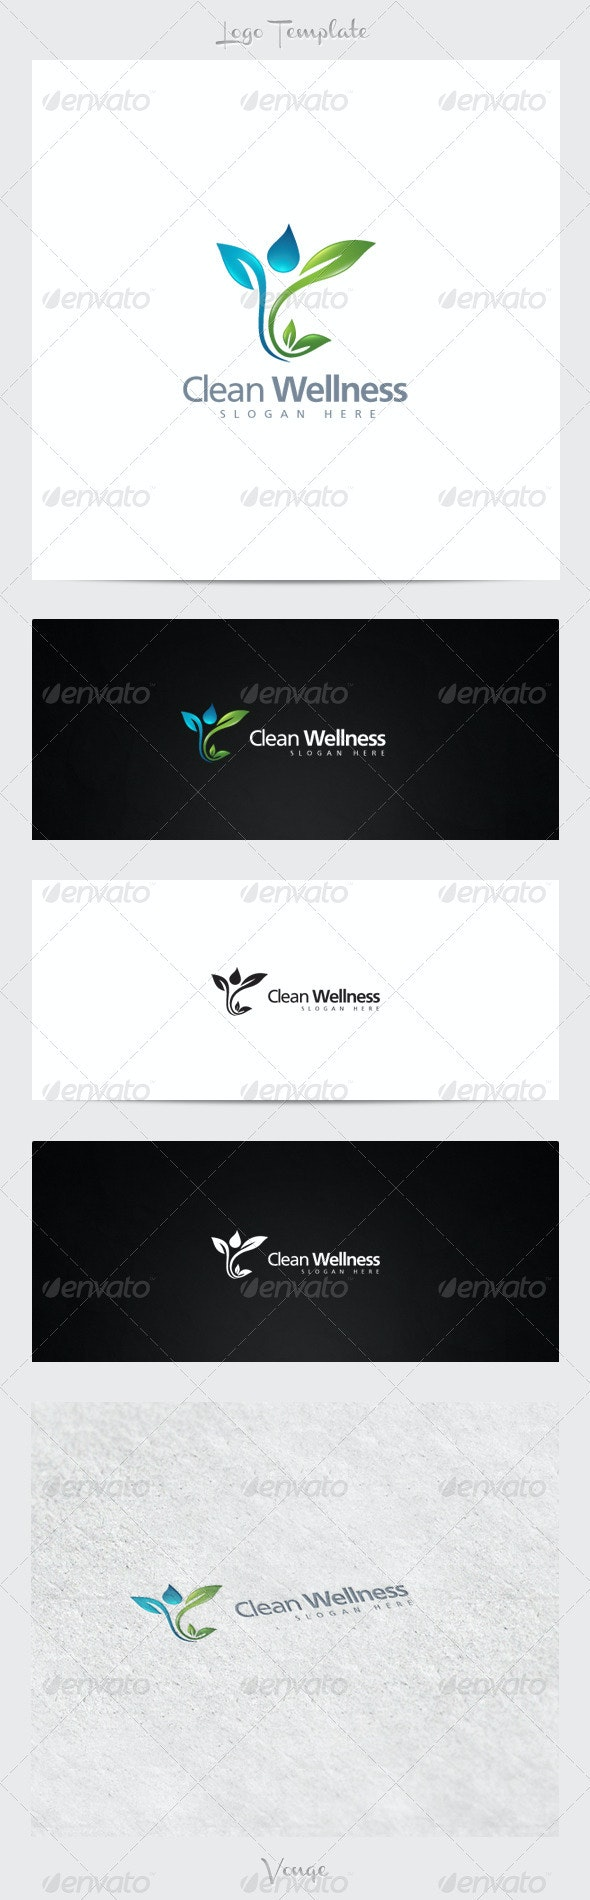 Clean Wellness - Nature Logo Templates